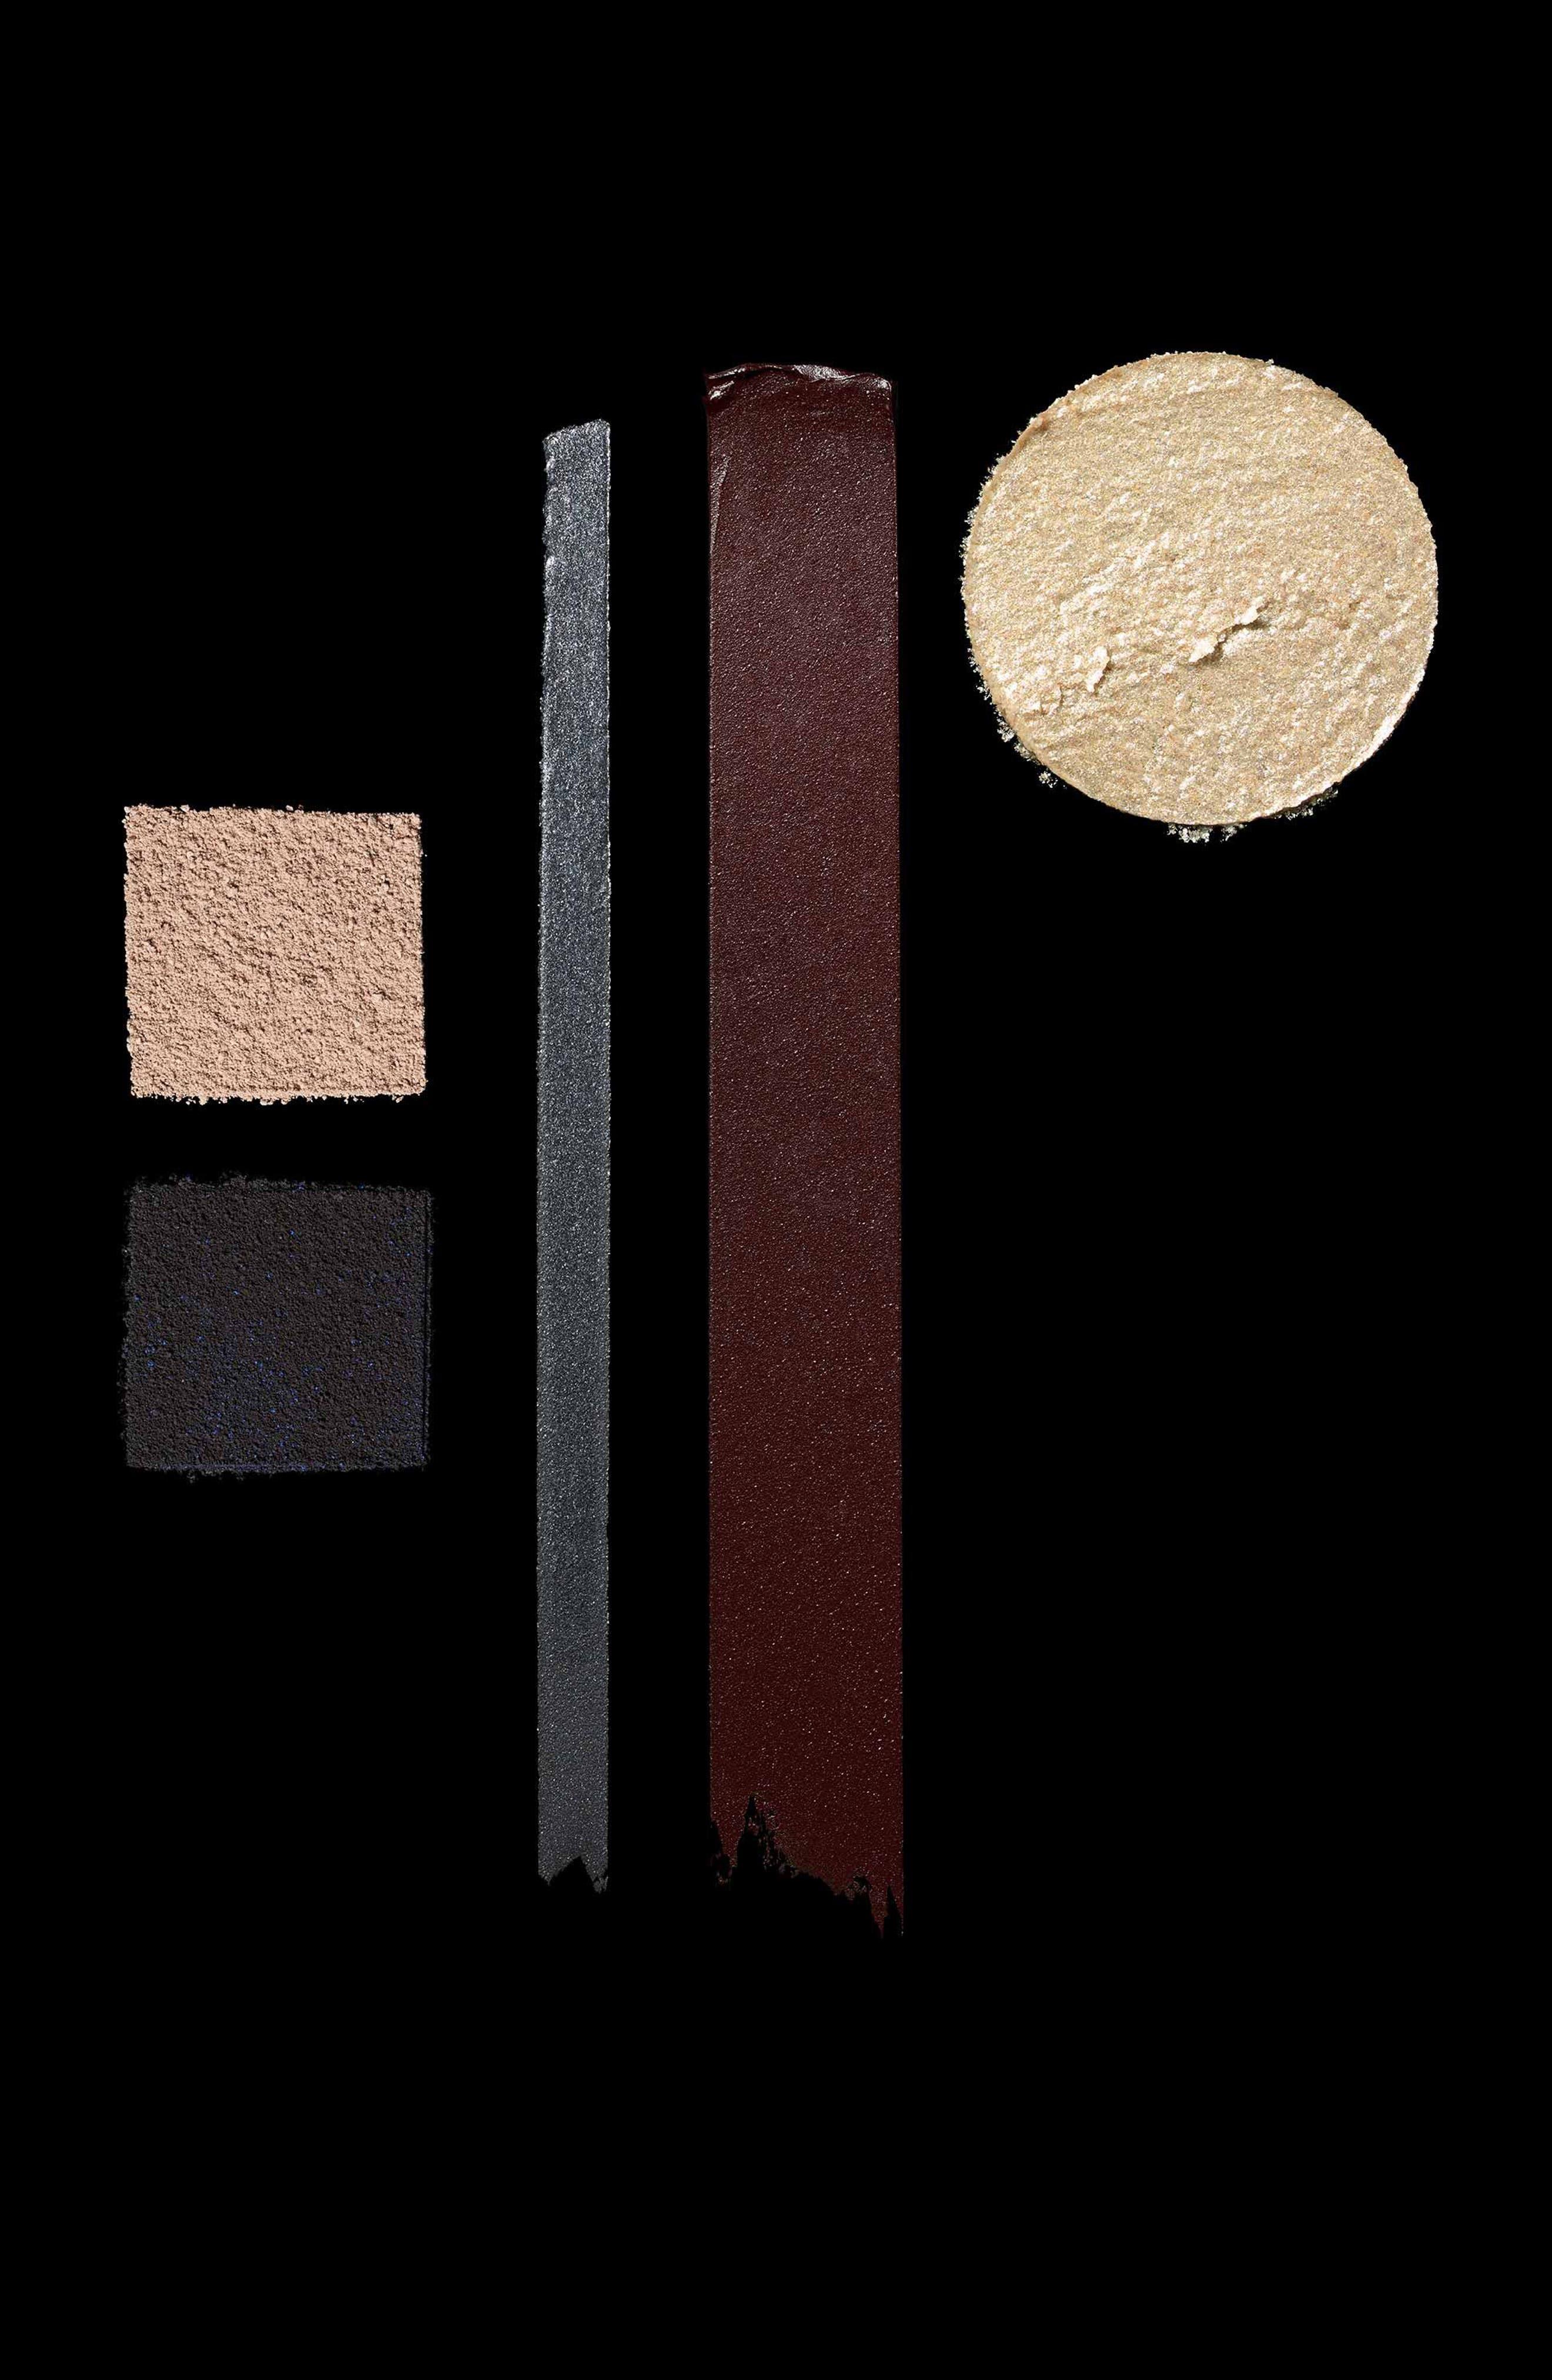 Victoria Beckham Eye Kajal,                             Alternate thumbnail 11, color,                             Black Saffron/ Vanille